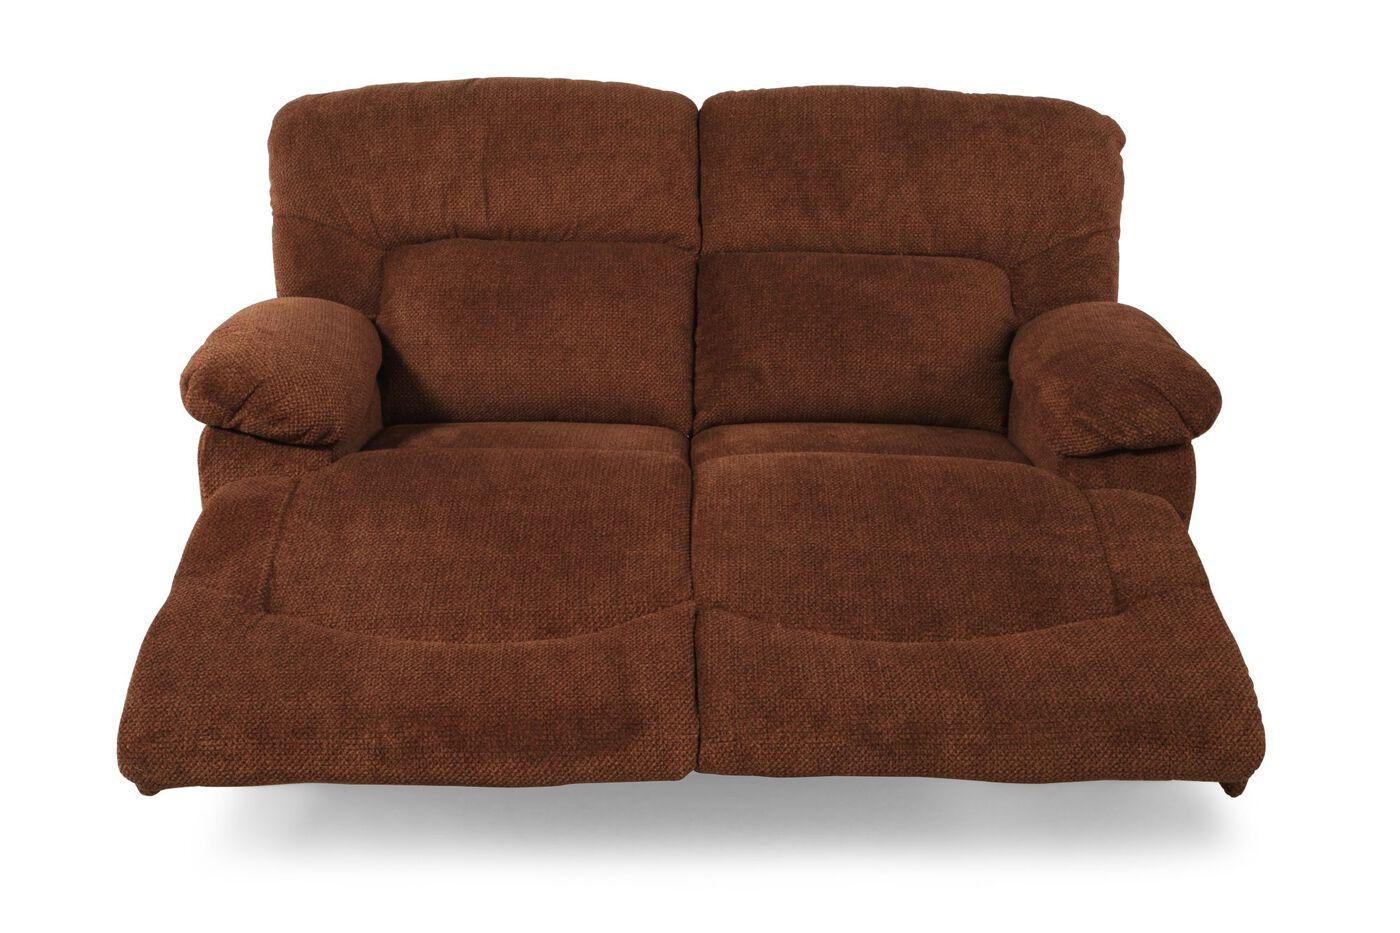 La Z Boy Asher Caramel Reclining Loveseat Mathis Brothers Furniture